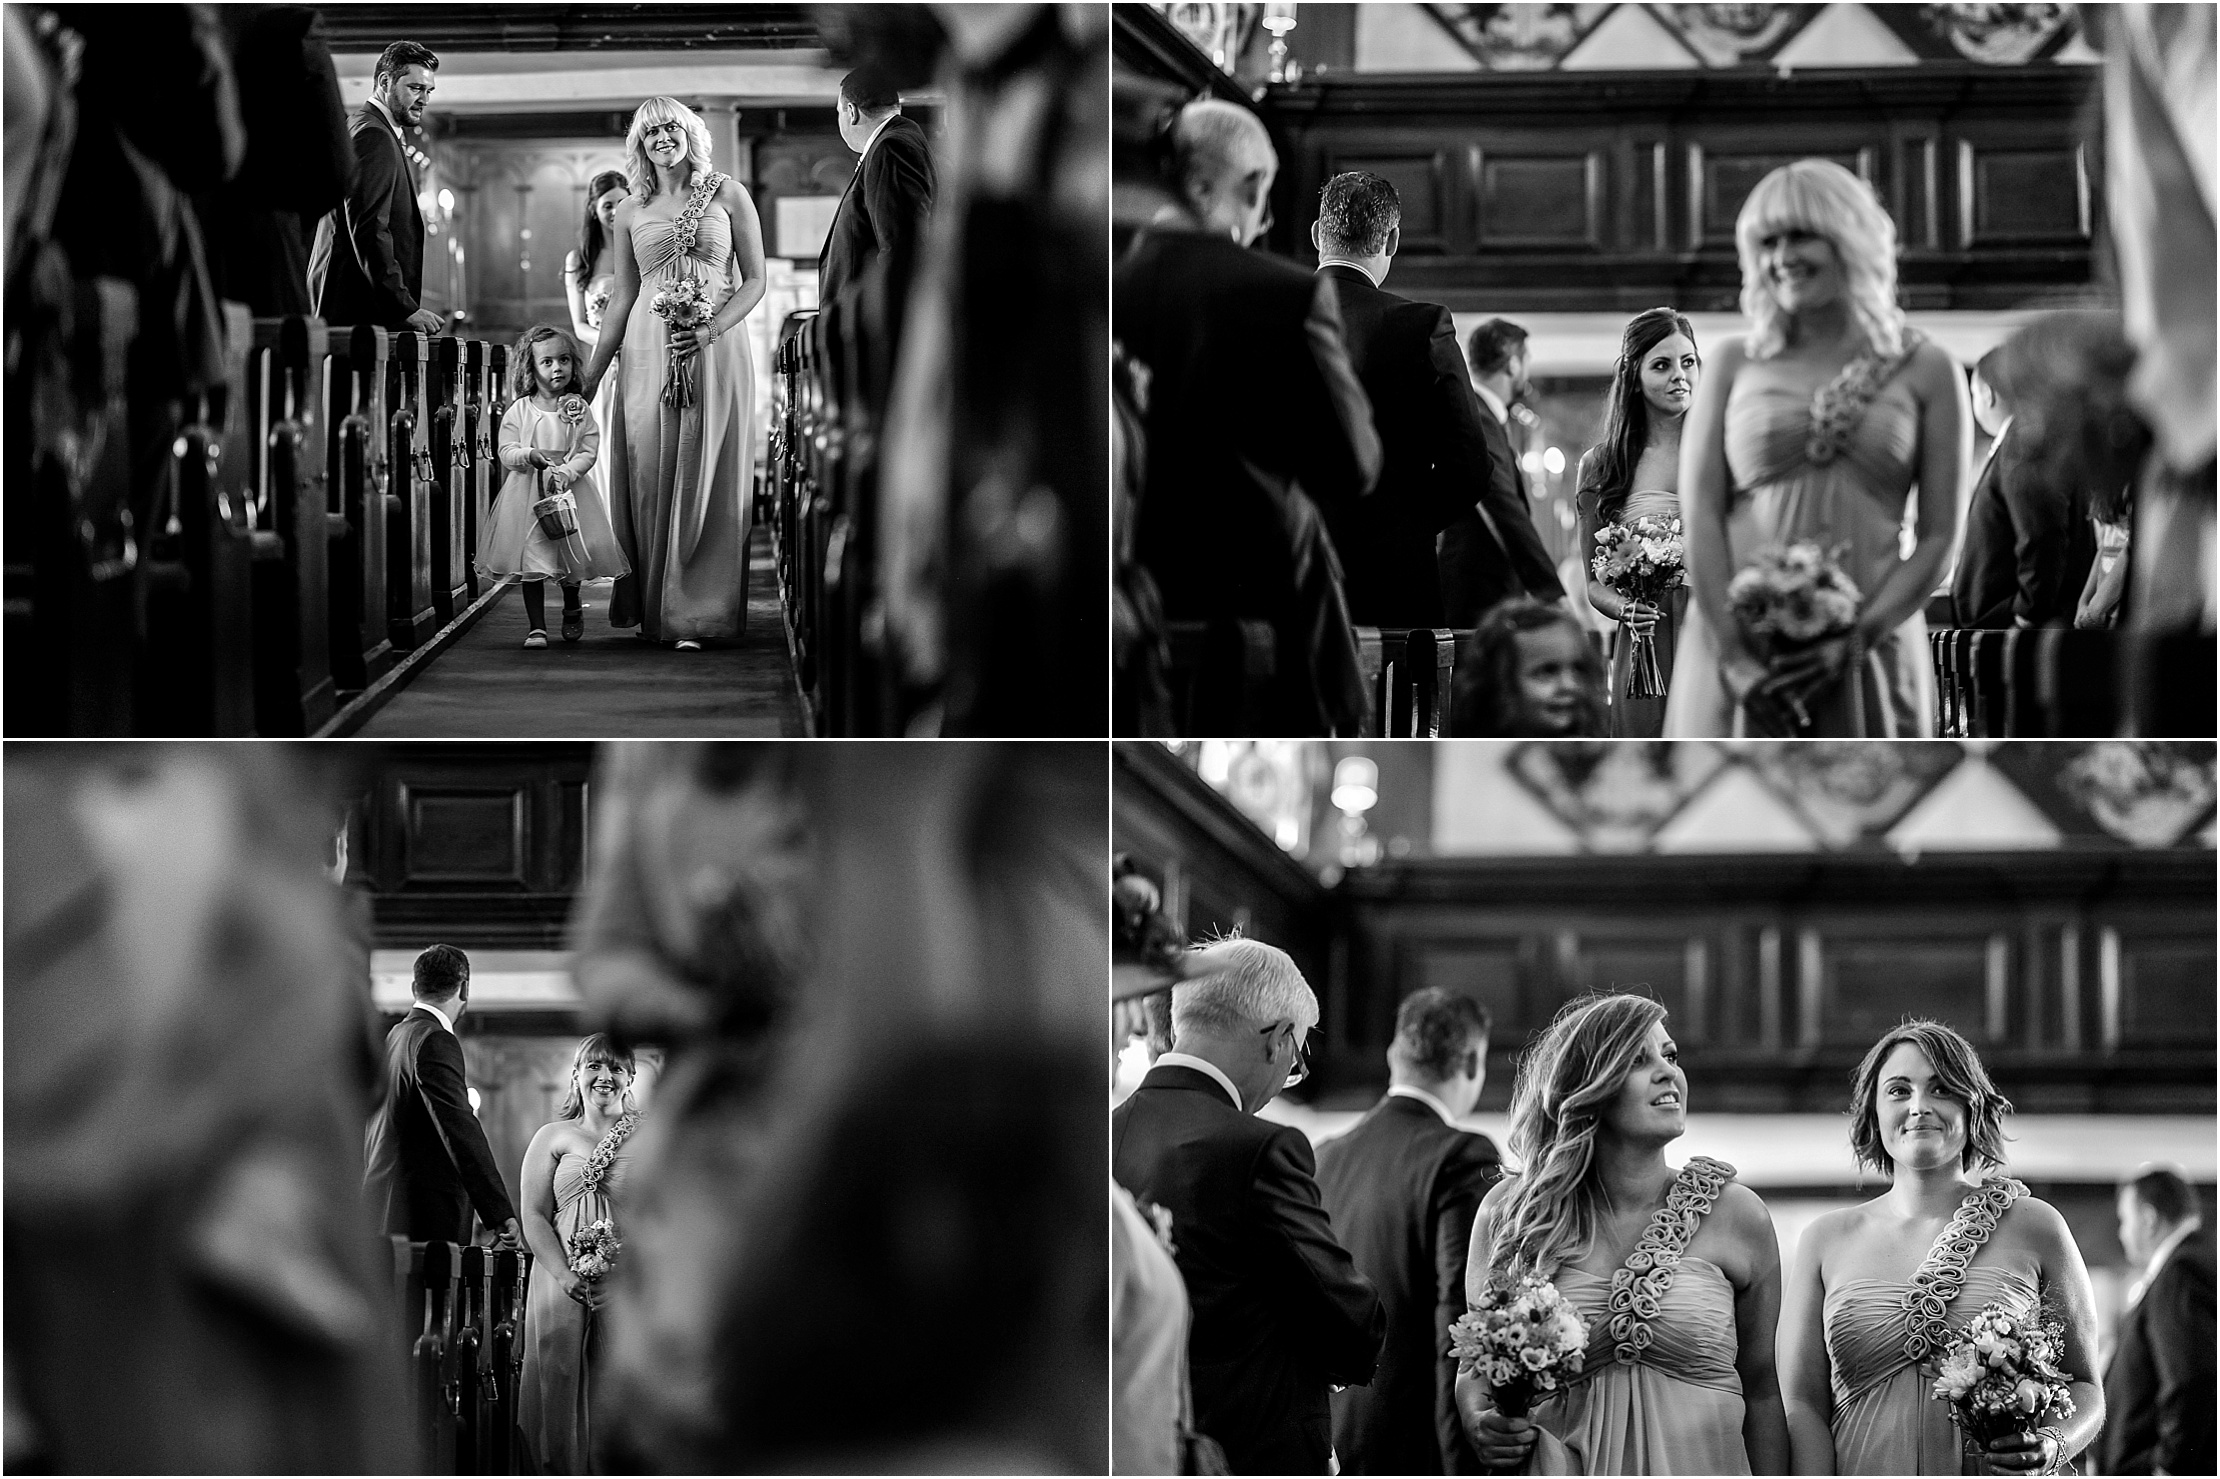 ashton-hall-wedding - 045.jpg